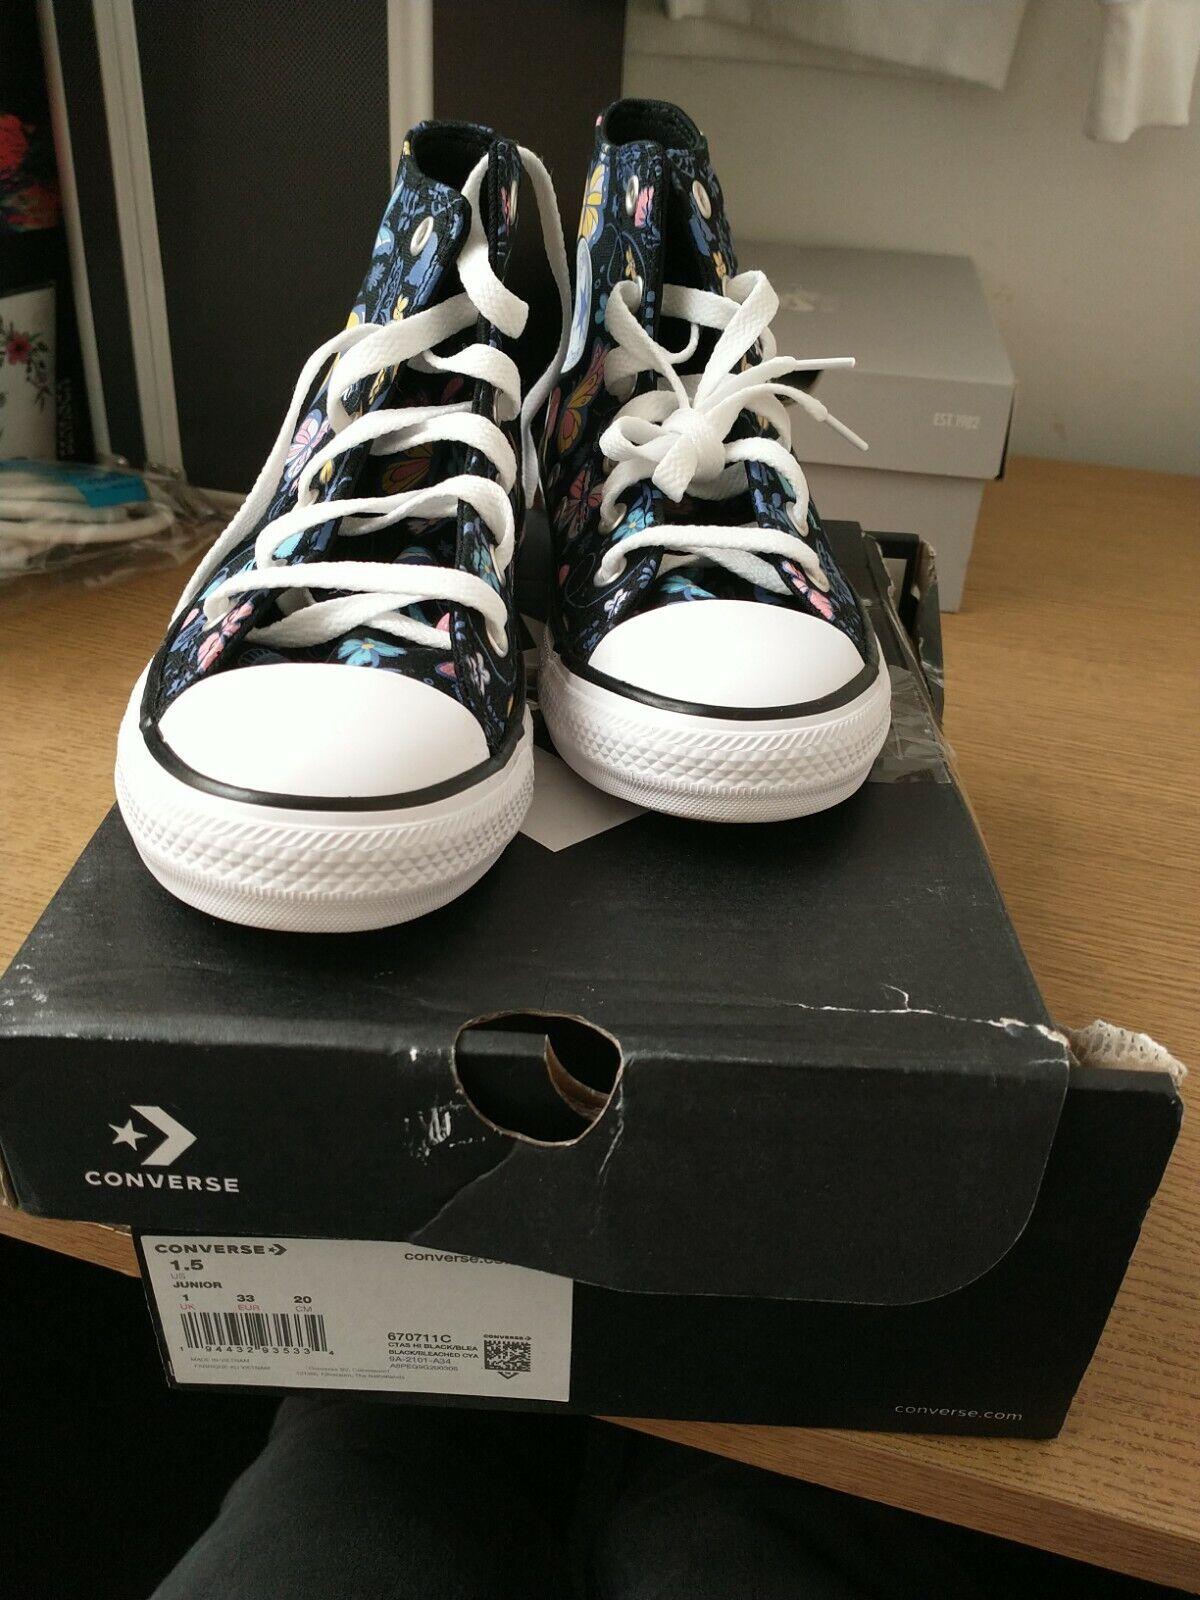 Converse Junior UK 1 Hi Black Butterfly Trainers. New But Box Damage. Ref Shelf